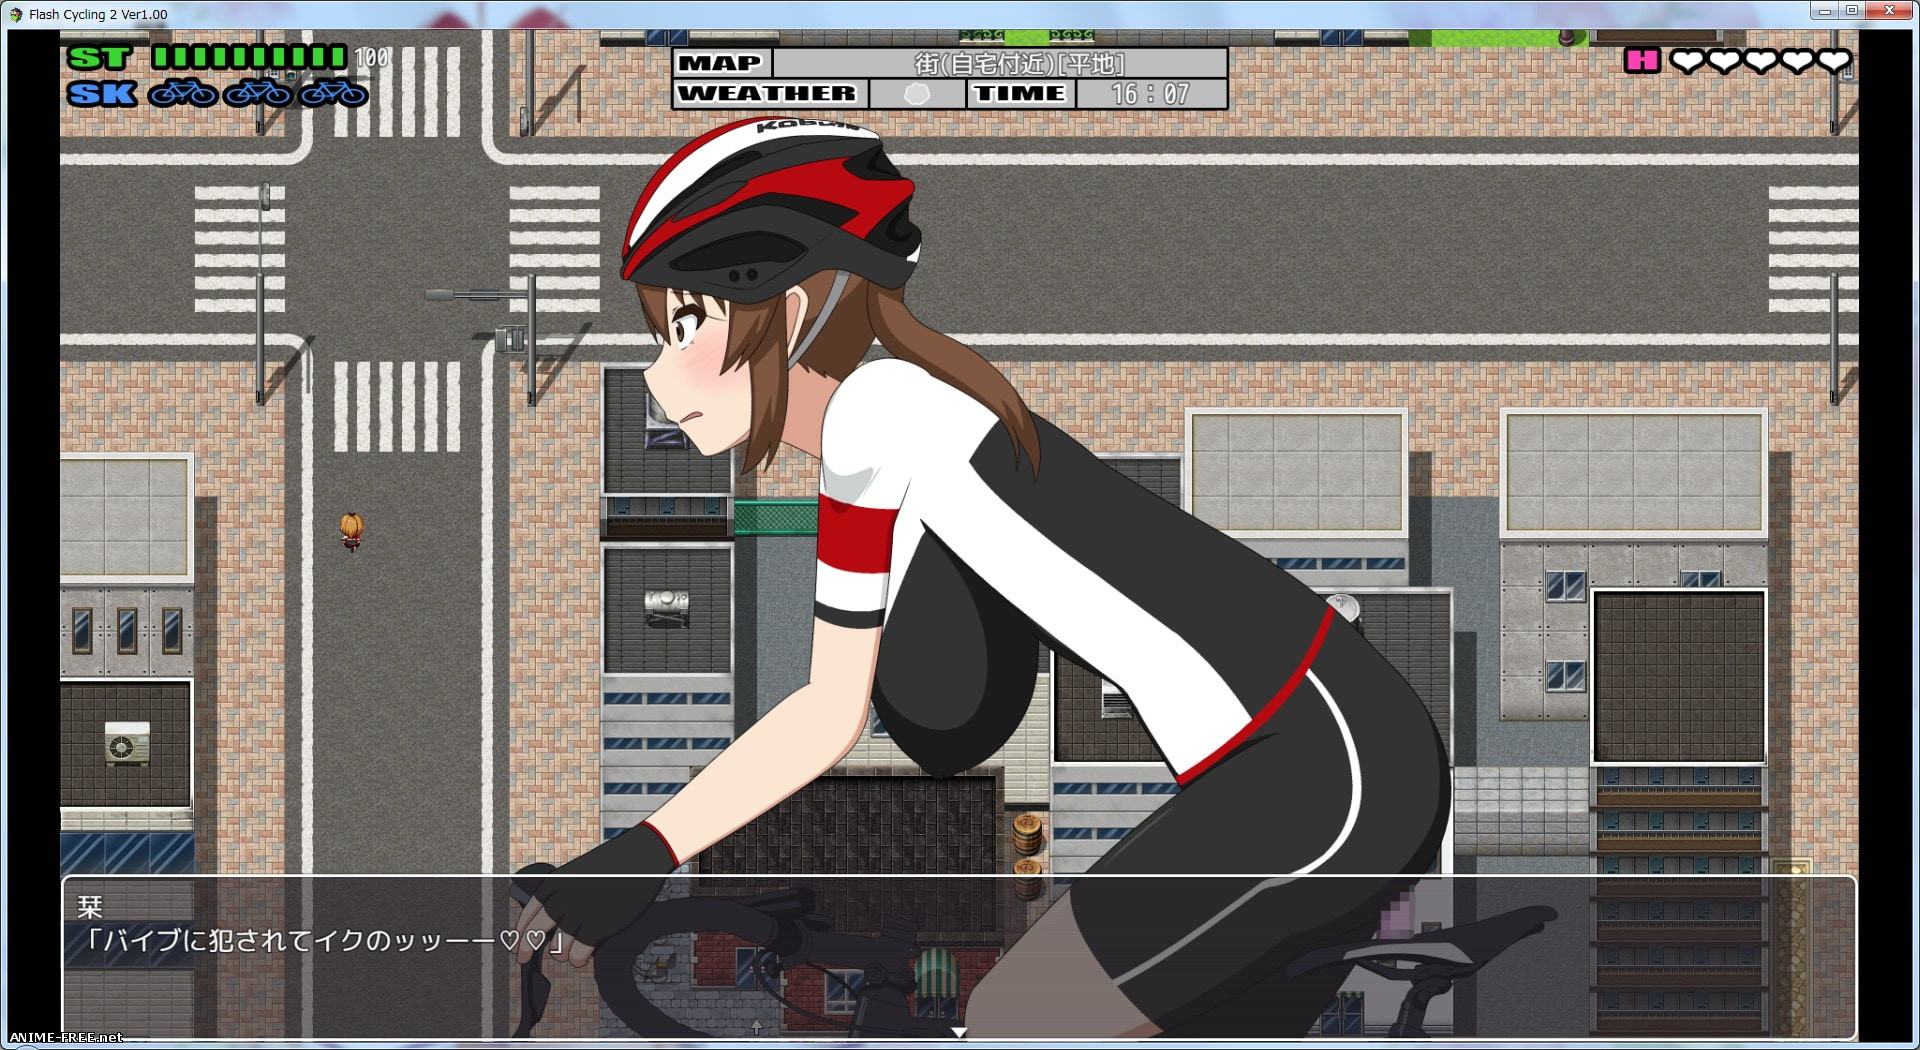 FlashCyclingRide.2 [Free Ride Exhibitionist RPG] [2020] [Cen] [jRPG] [JAP,ENG] H-Game